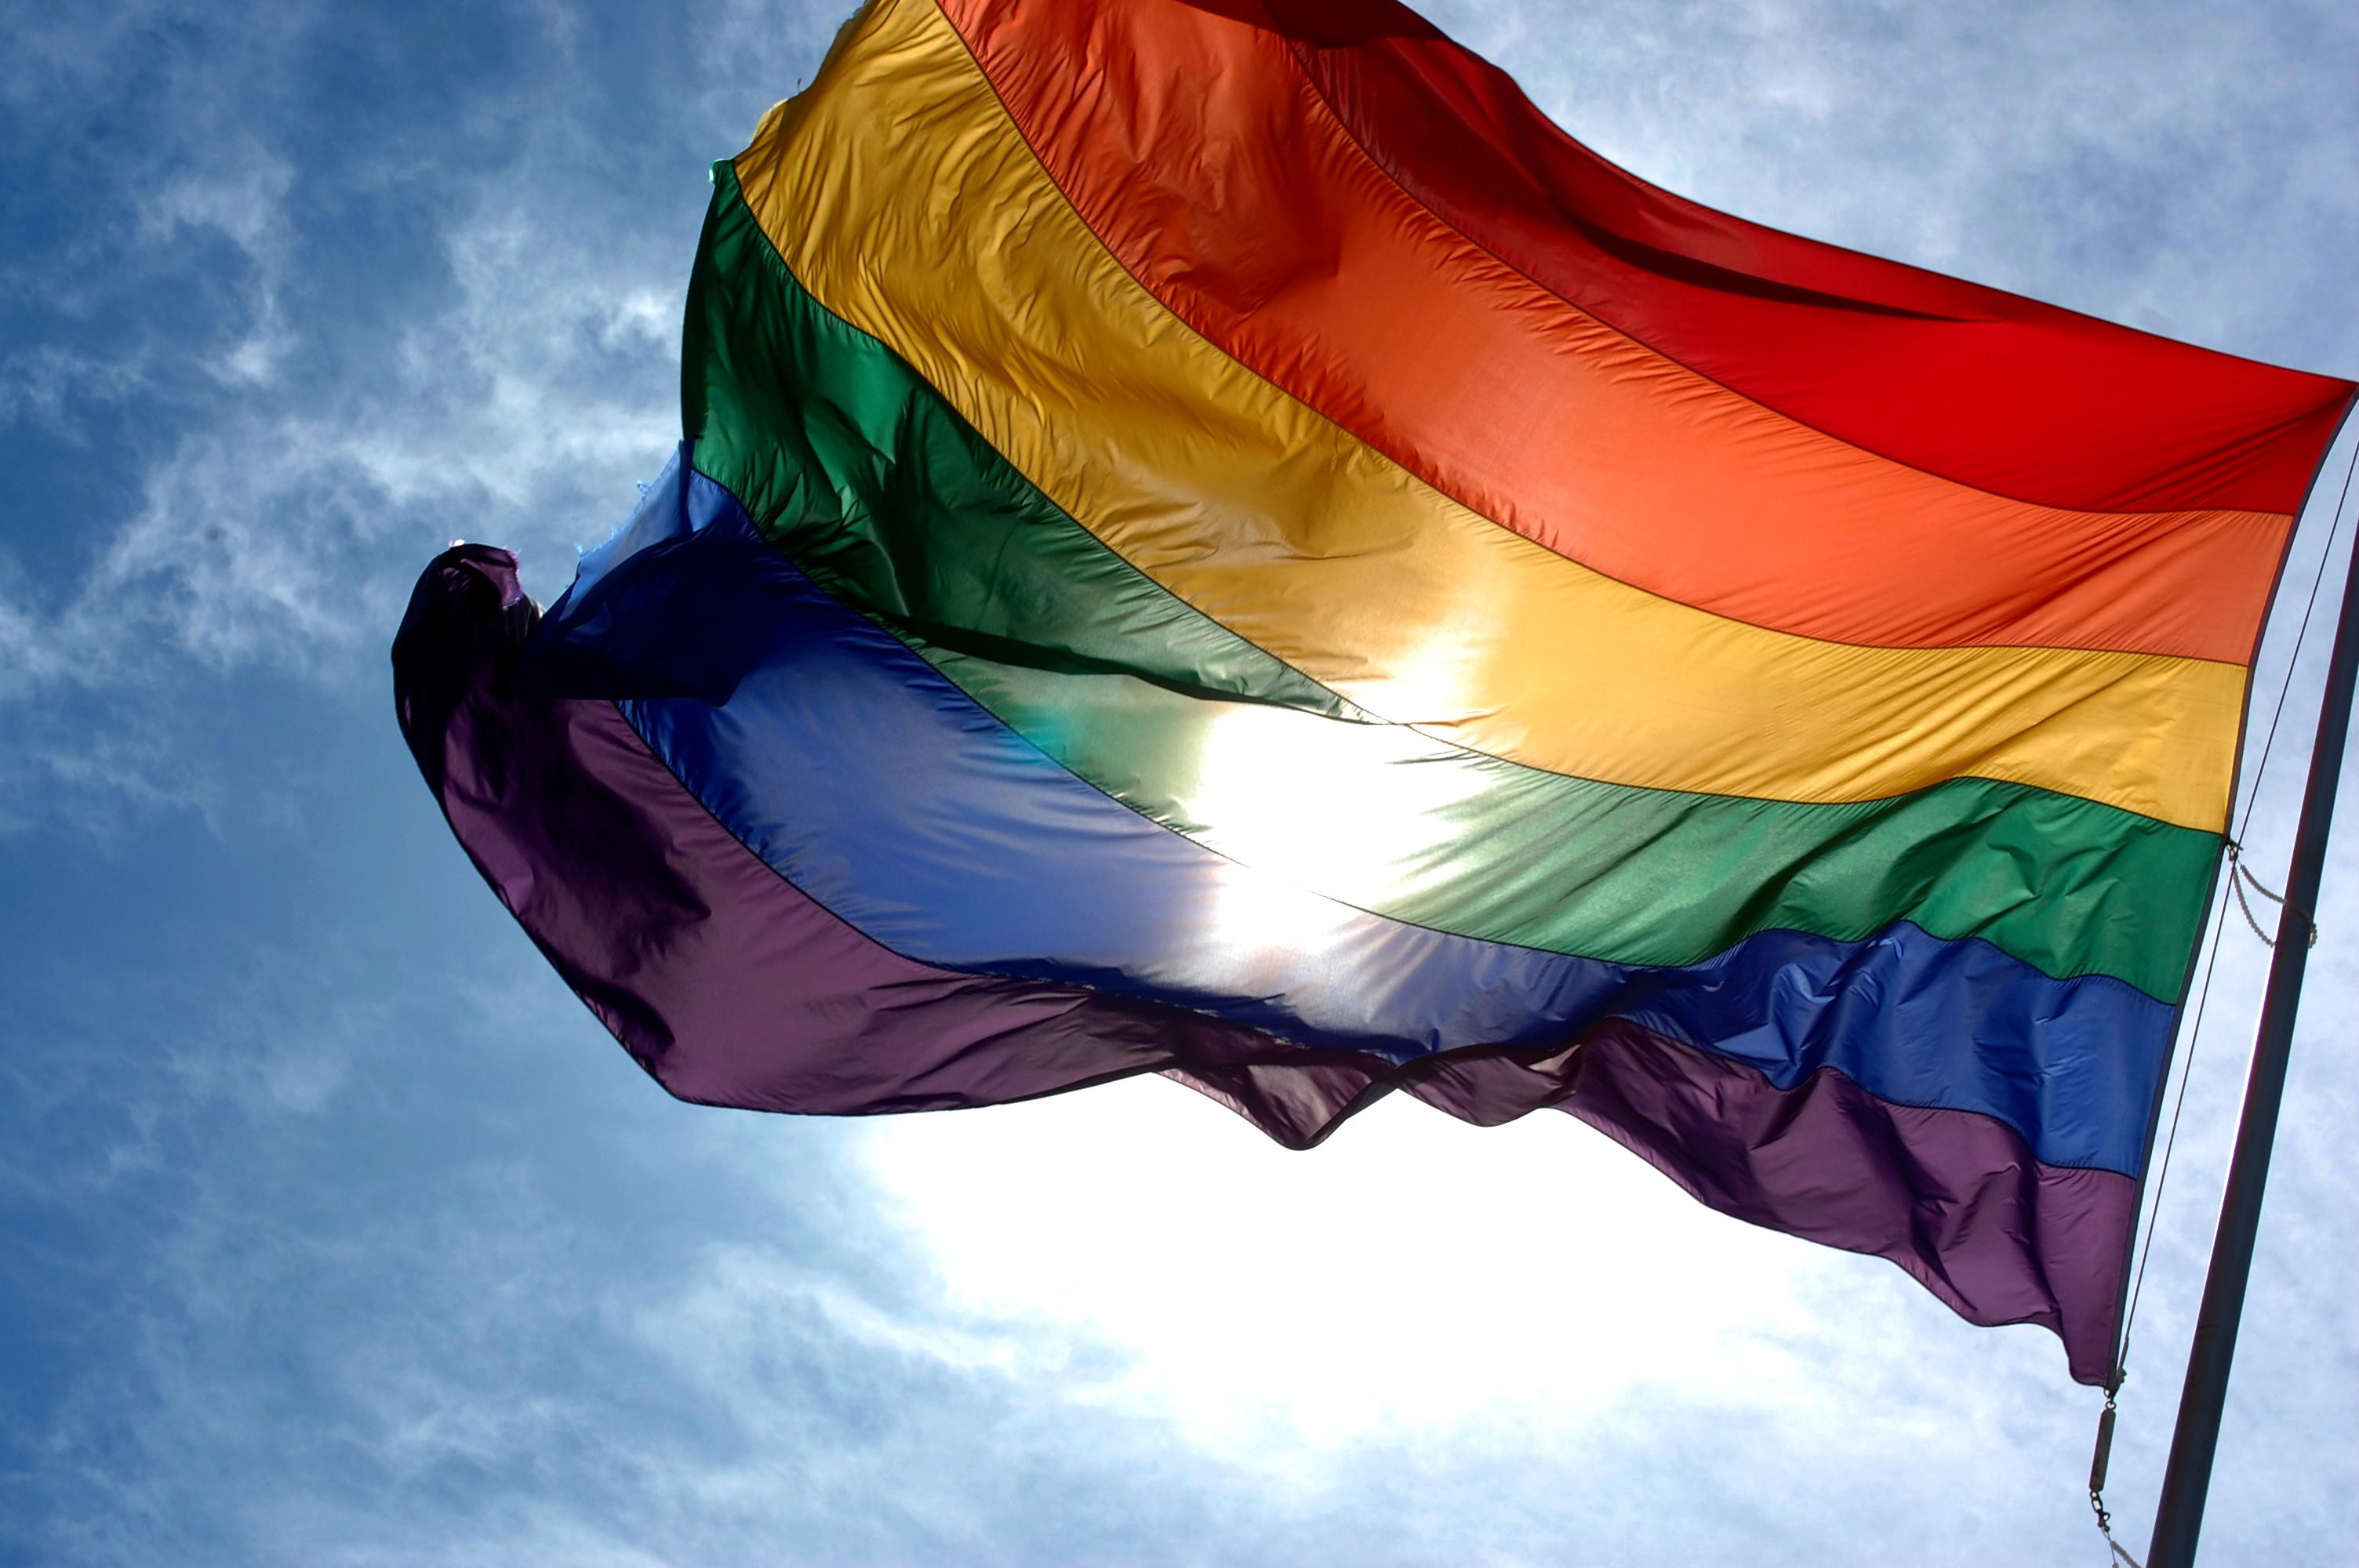 School Survey Asks Sixth Graders About Visiting Gay Bars   Todd Starnes